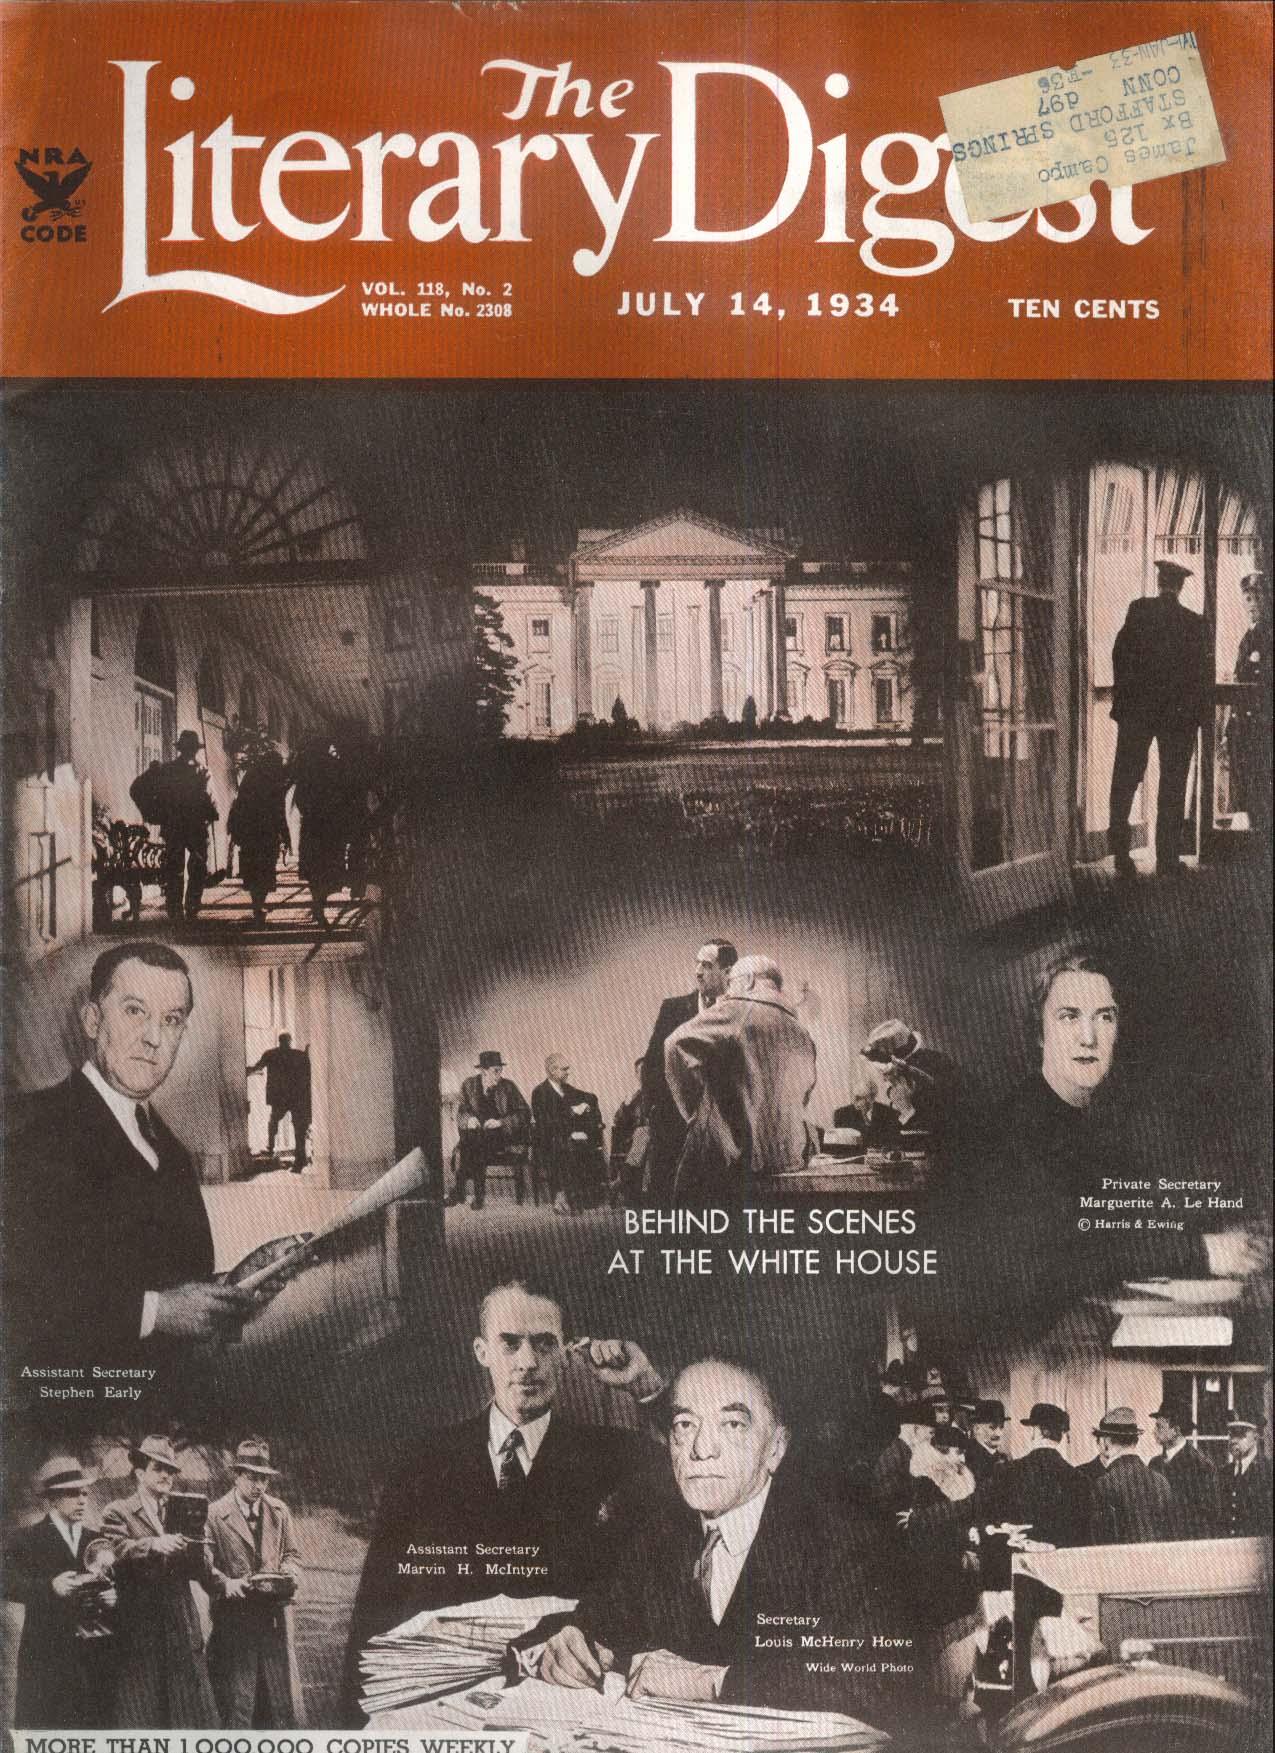 LITERARY DIGEST Nazi New Deal Mooseheart Senator Lewis Keisuke Okada 7/14 1934